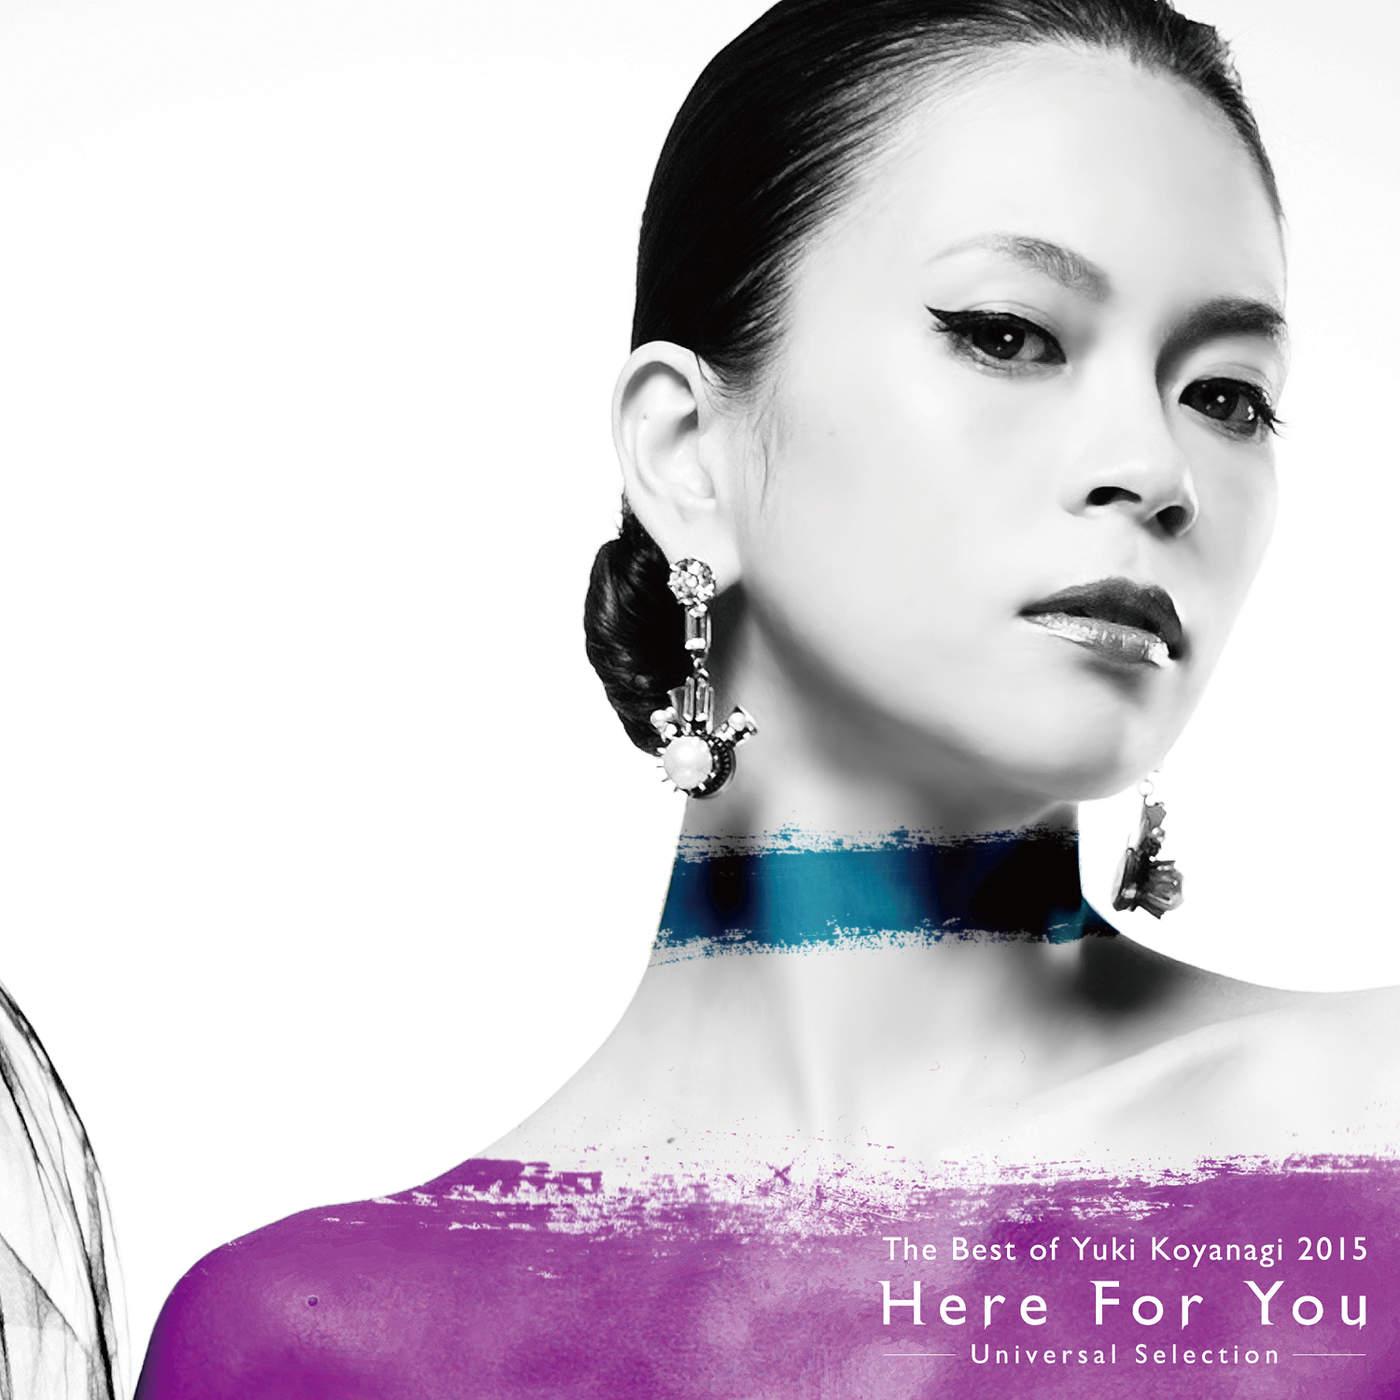 The Best of Yuki Koyanagi 2015 Here For You - Universal Selection -